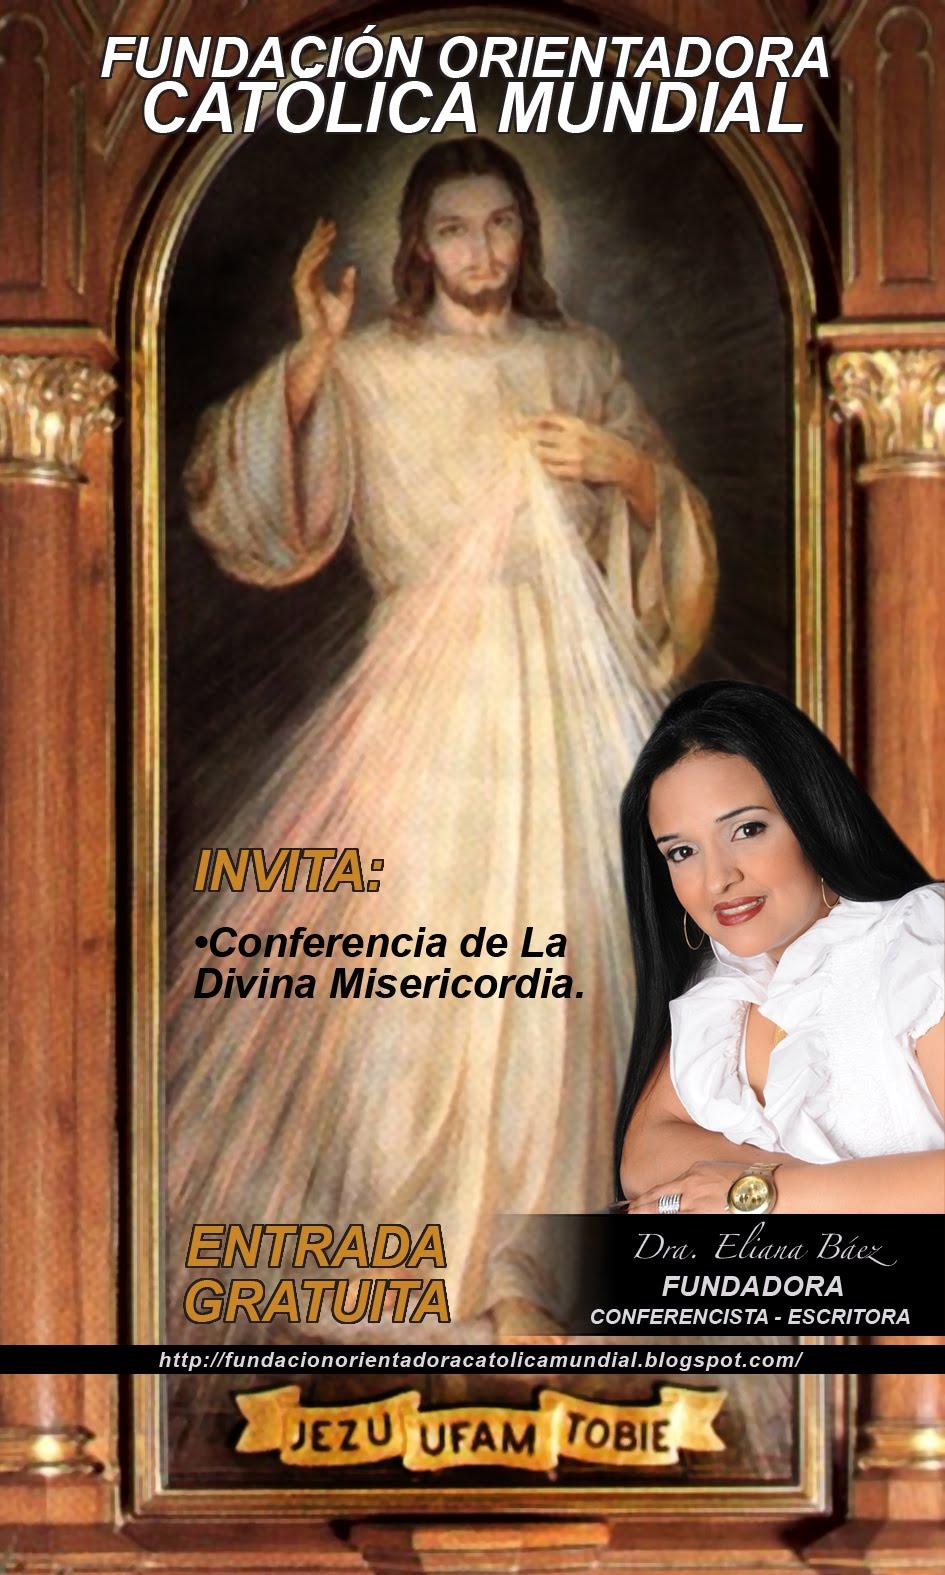 Conferencias de la Divina Misericordia con testimonio .